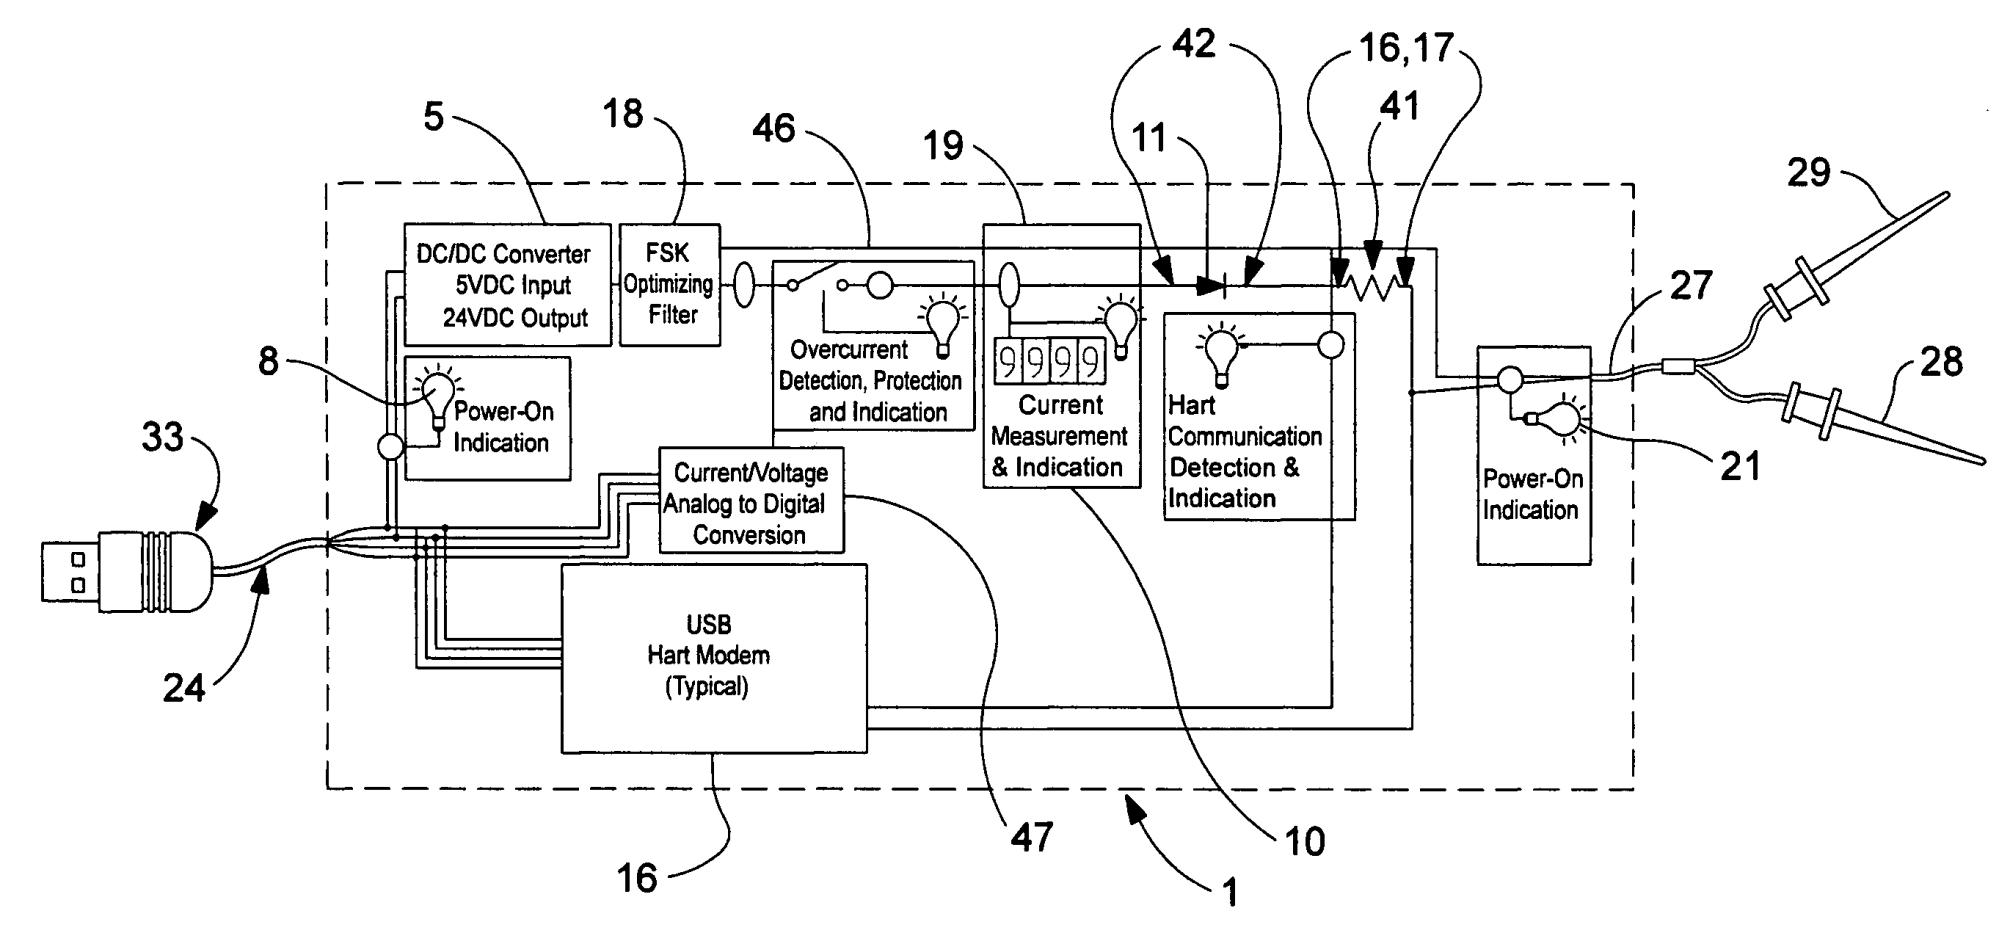 hight resolution of hart wiring diagram heart anatomy diagram u2022 edmiracle co hart multidrop wiring diagram hart multiplexer wiring